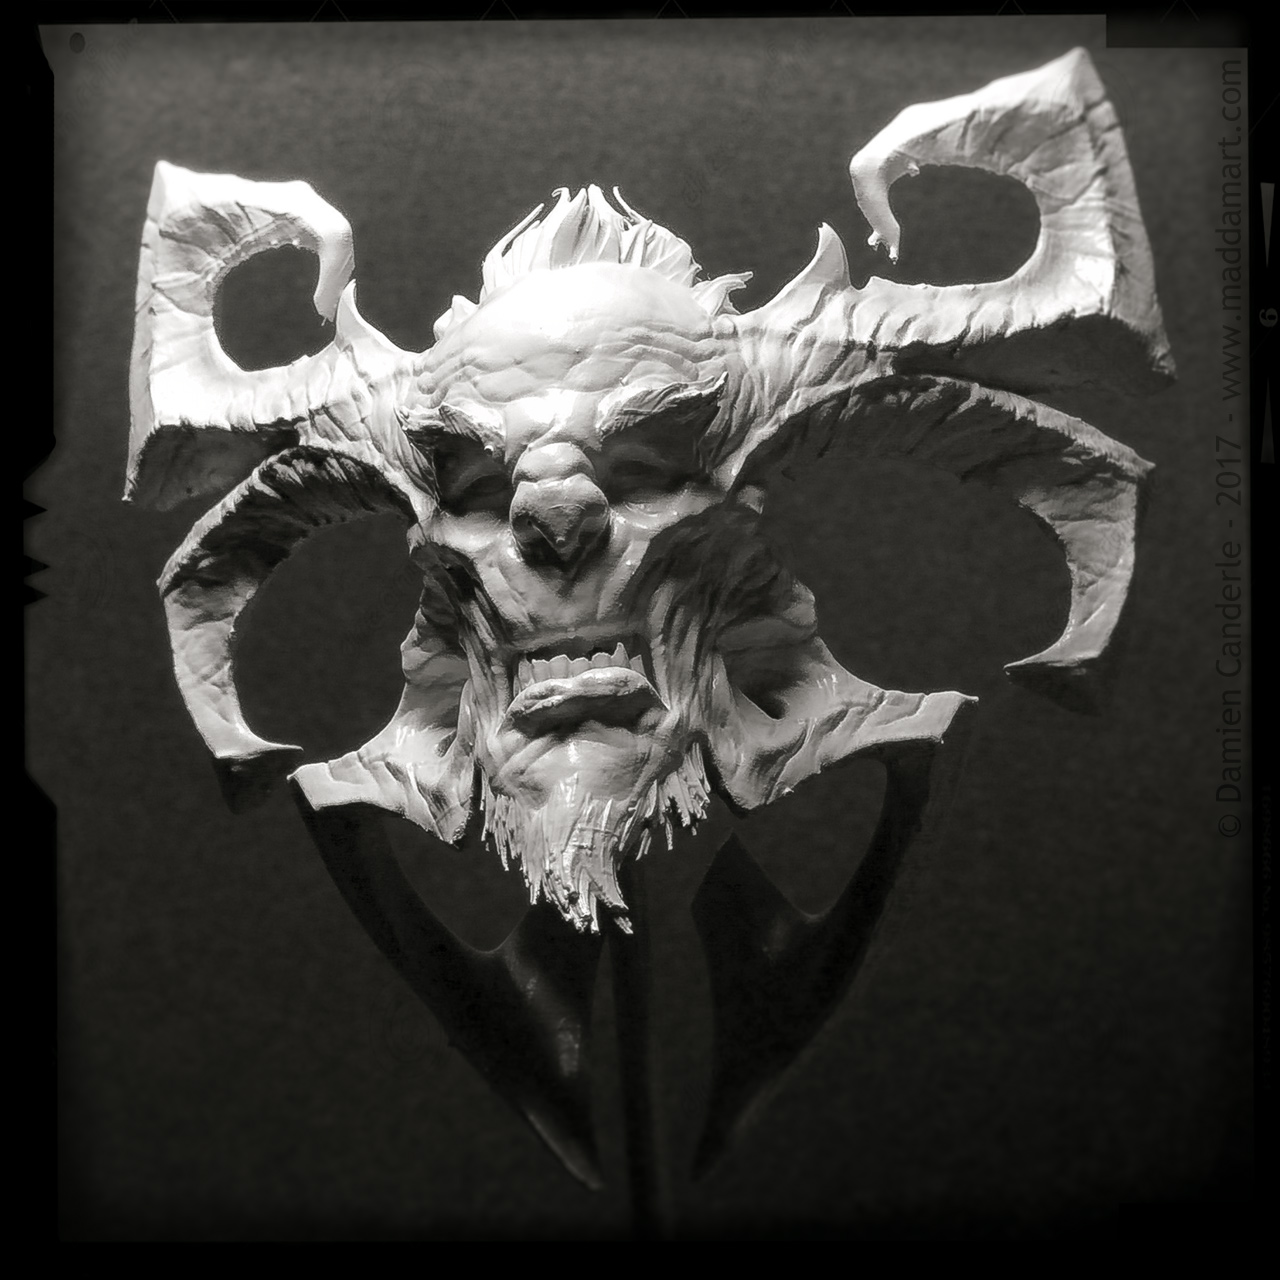 Damien_Canderle_Demon_05